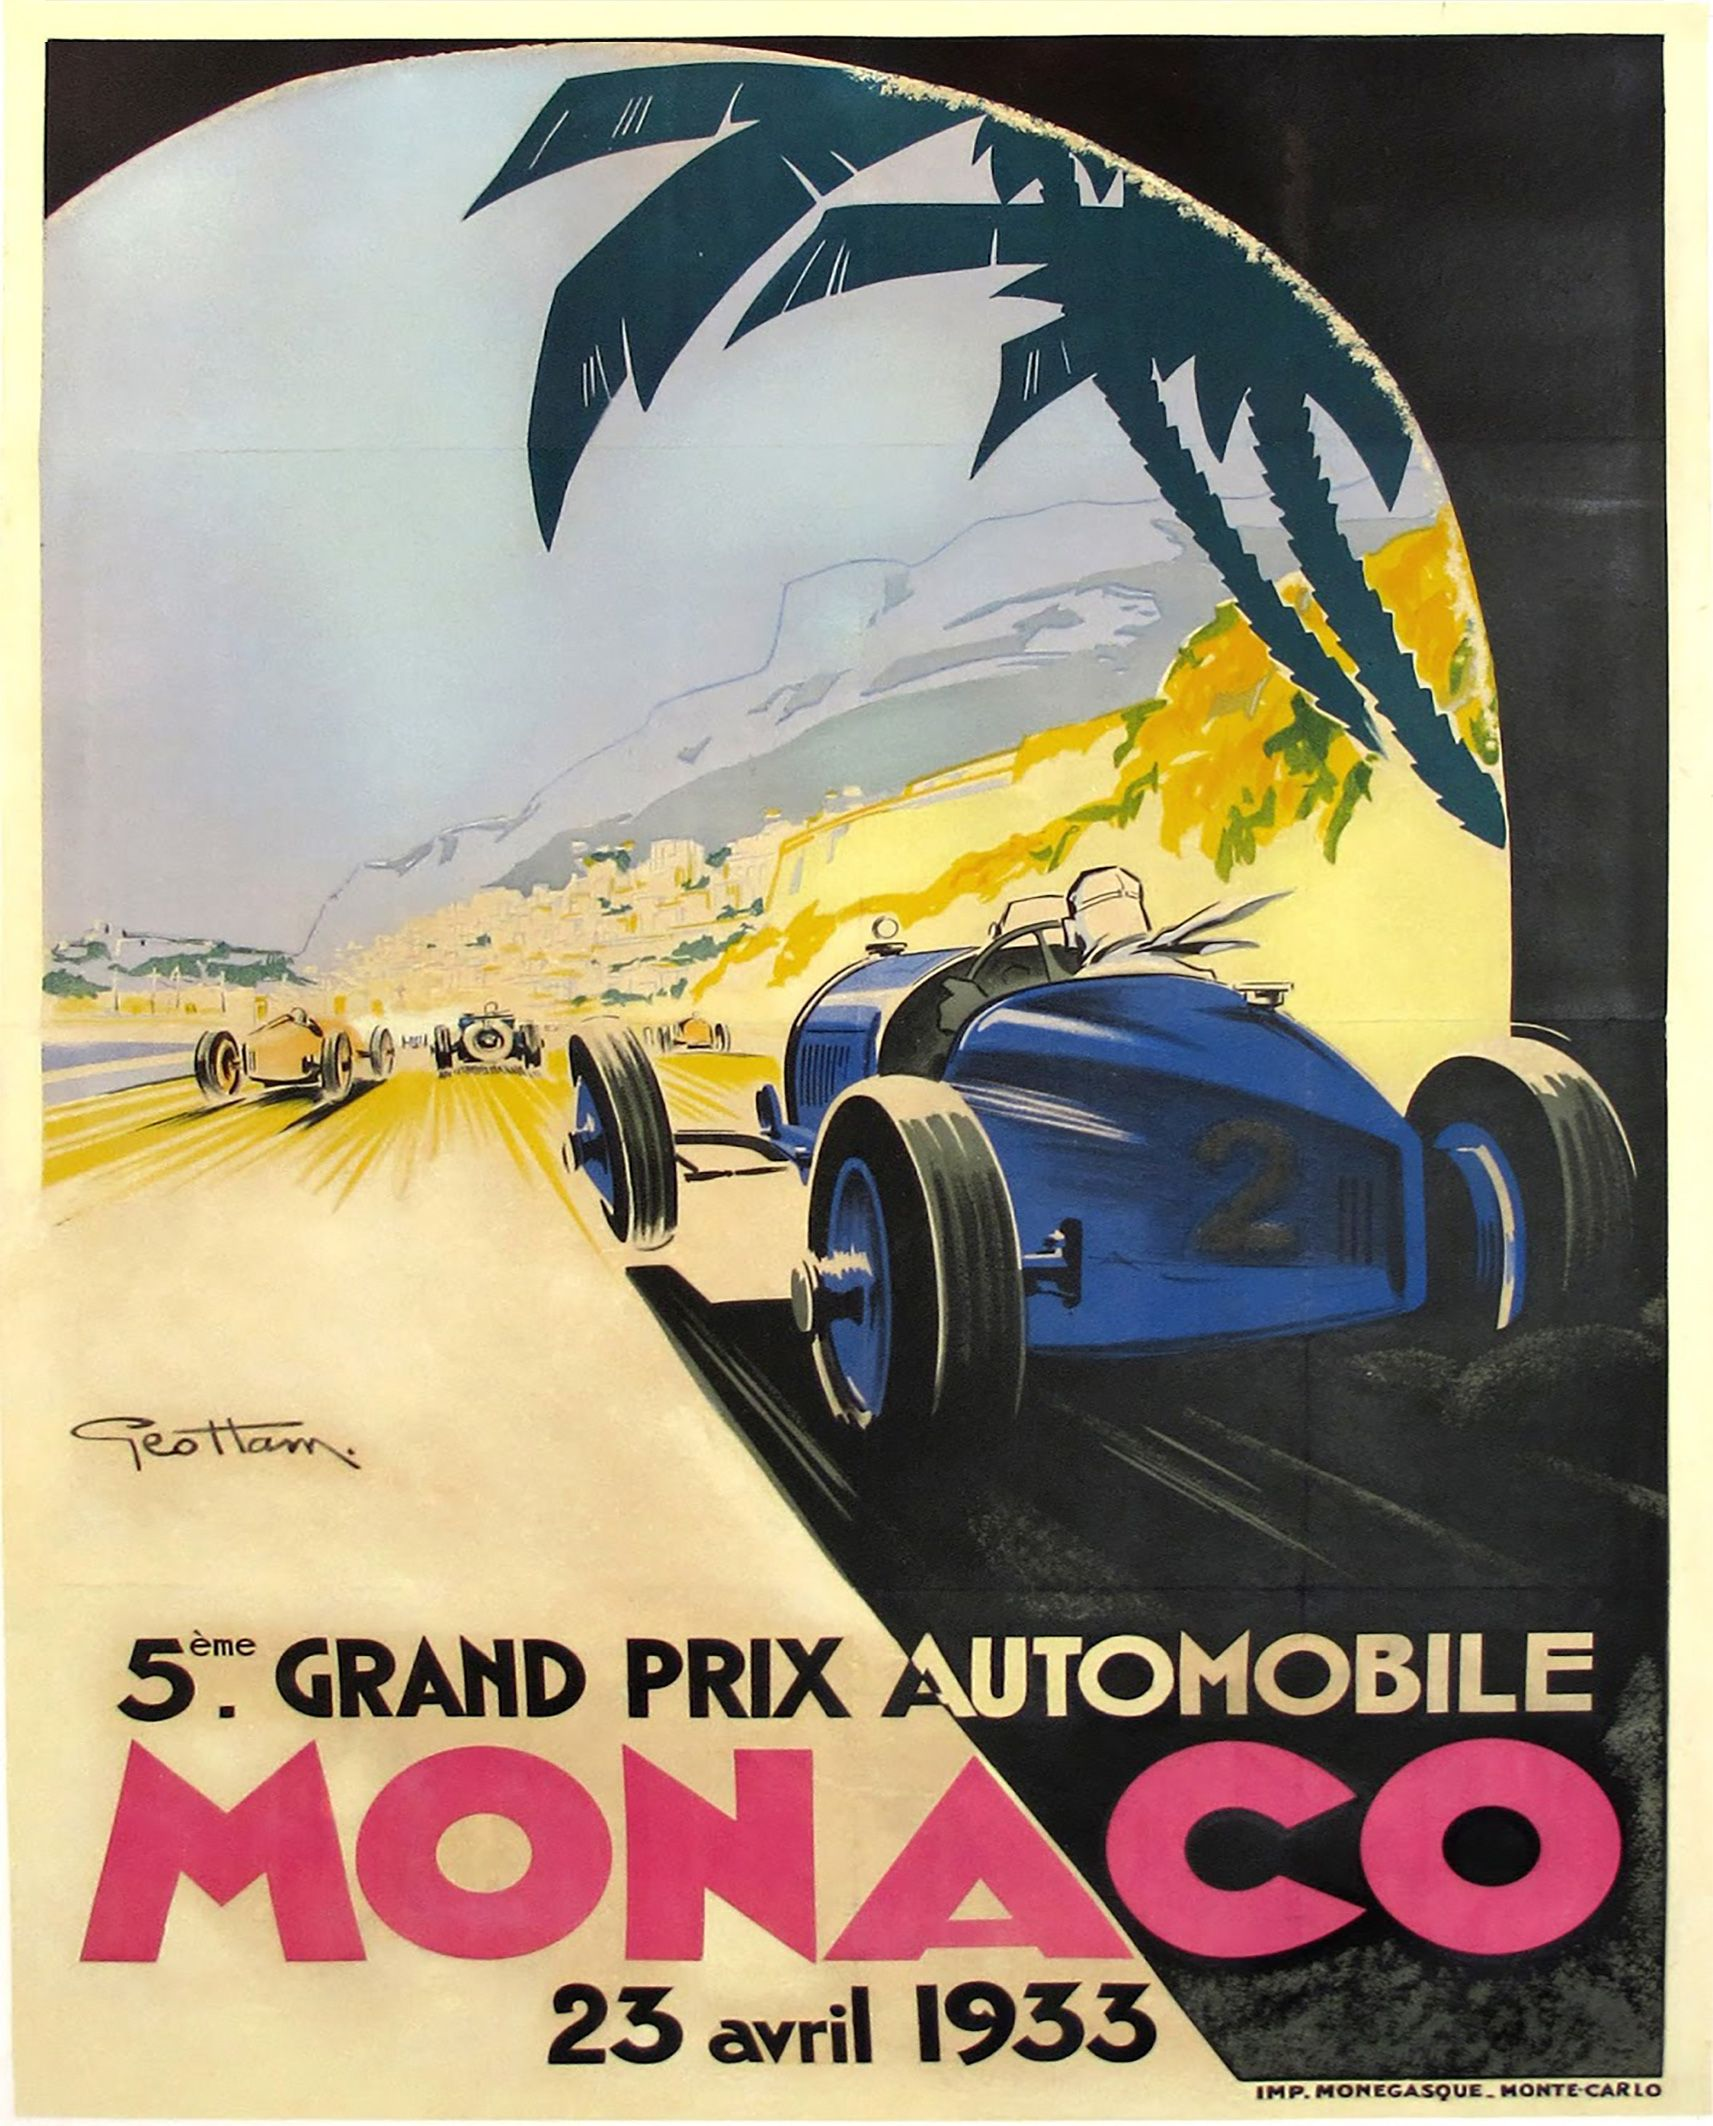 16x24 1949 European Grand Prix Vintage Style Racing Poster